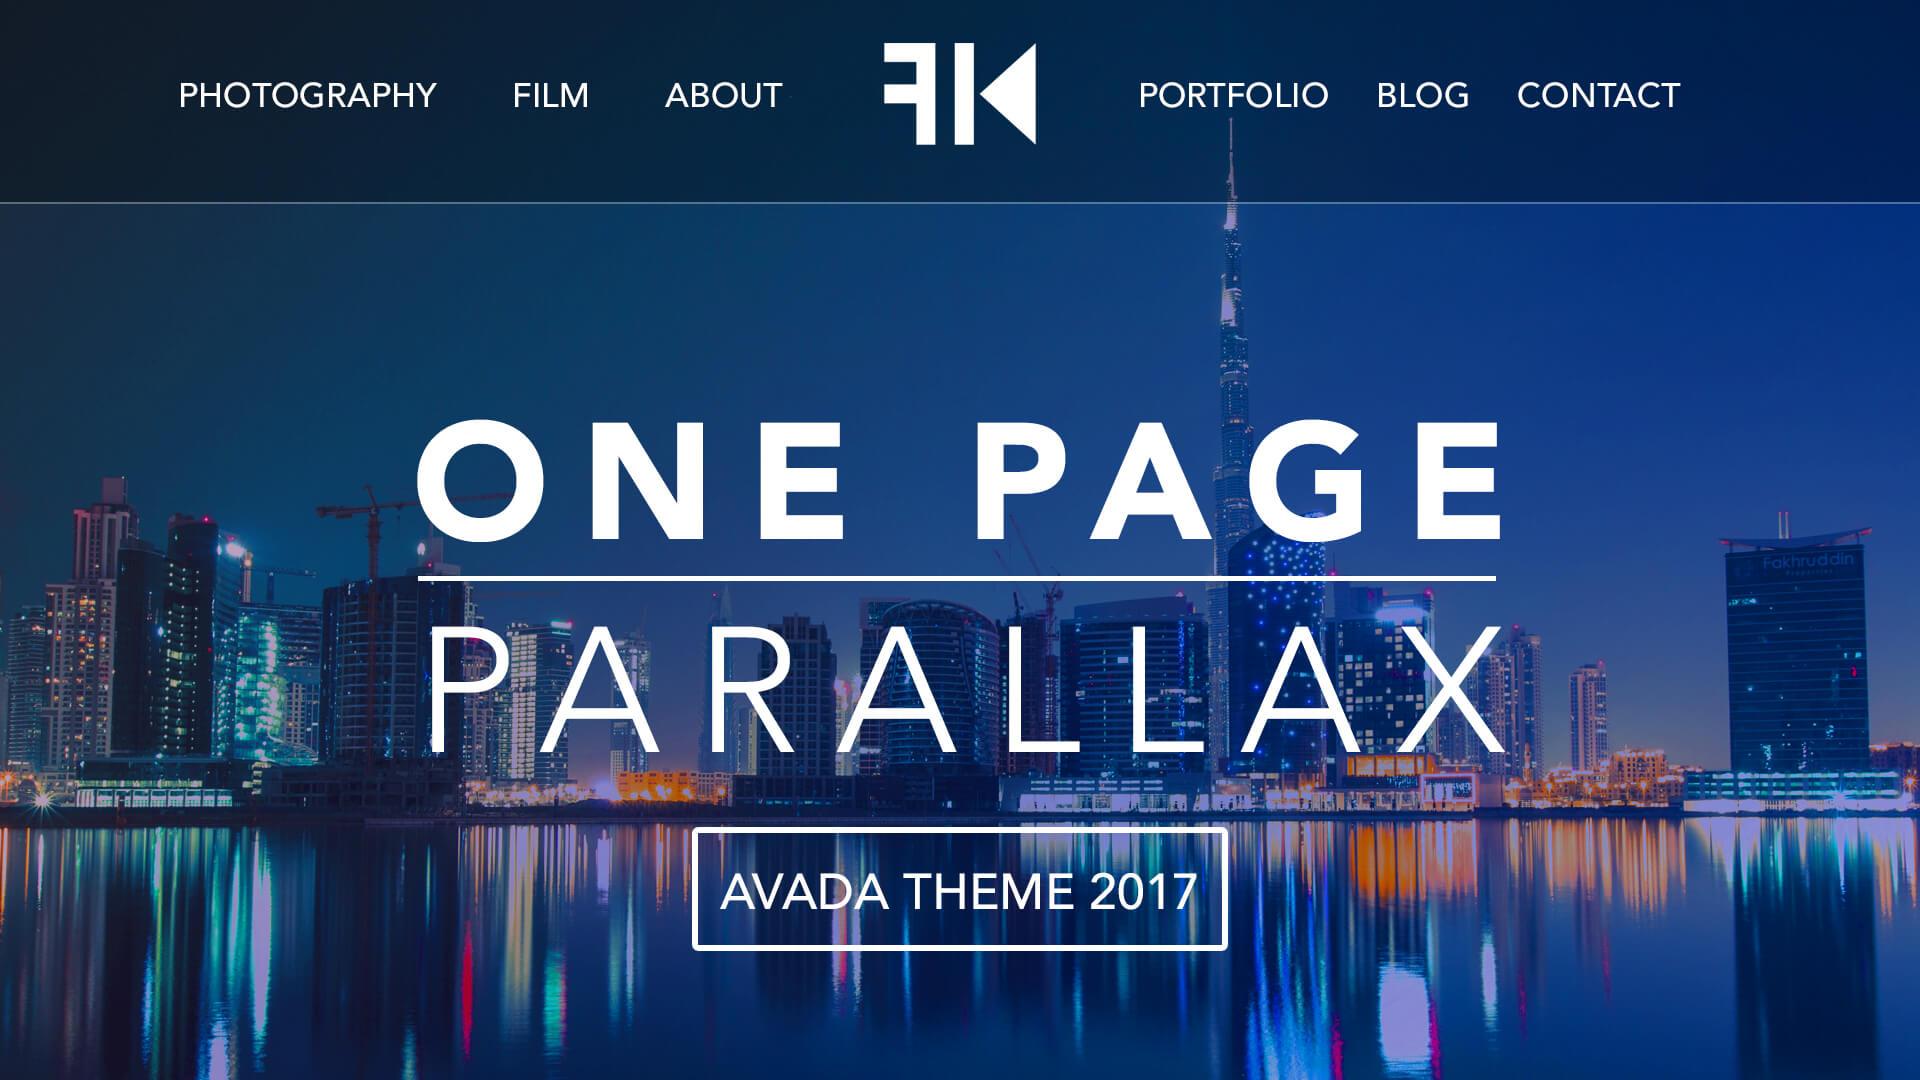 parallax tutorial 2017 learn how to create a website ferdy